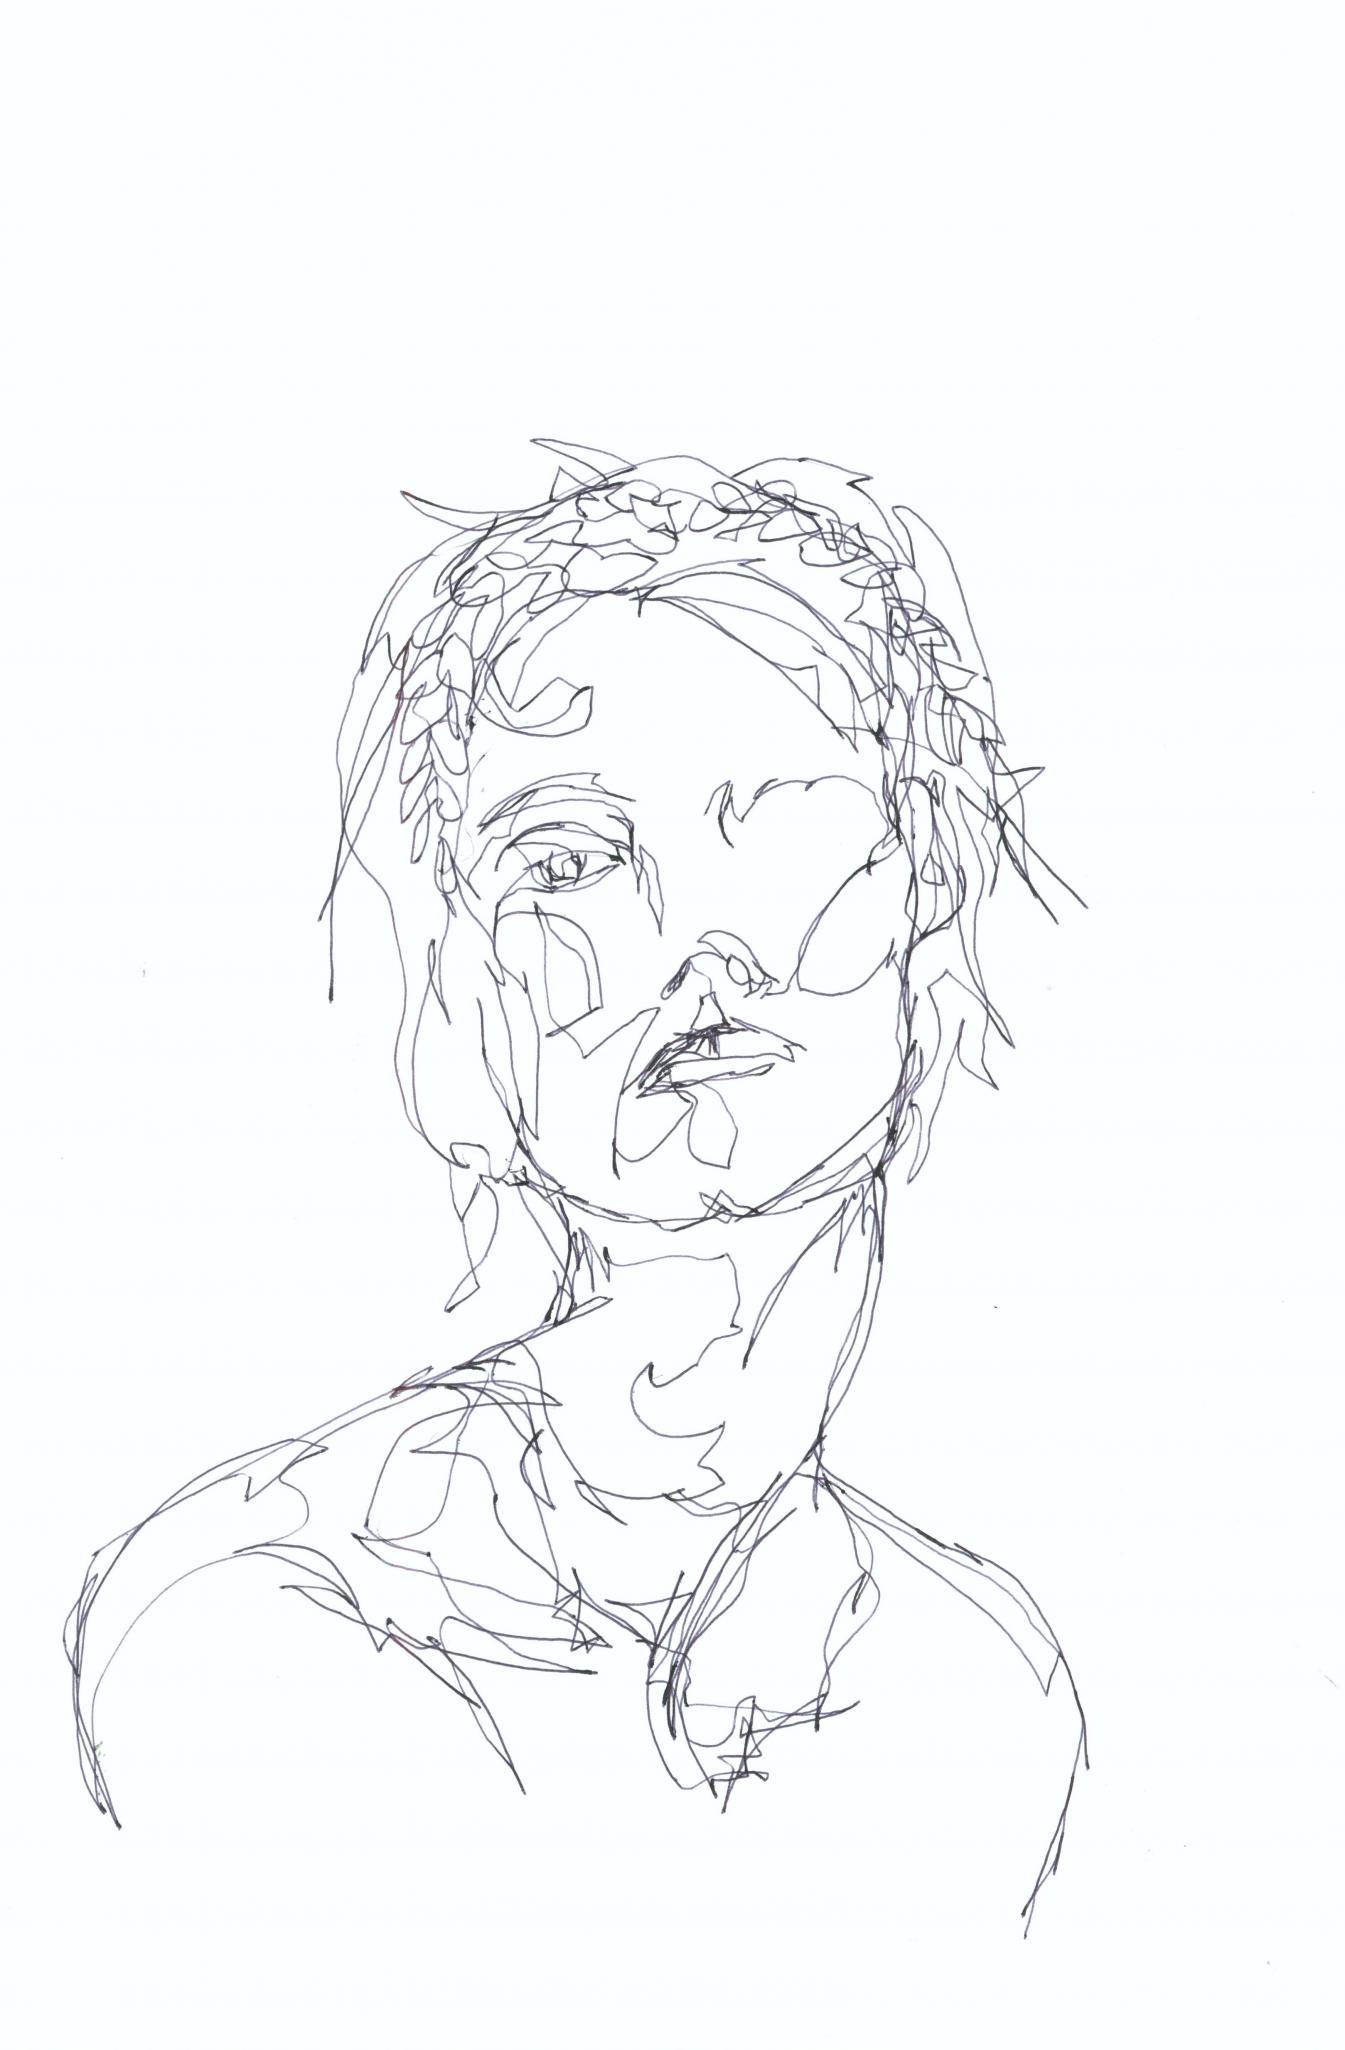 1345x2050 Line Drawing Ii The Original Online Art Gallery